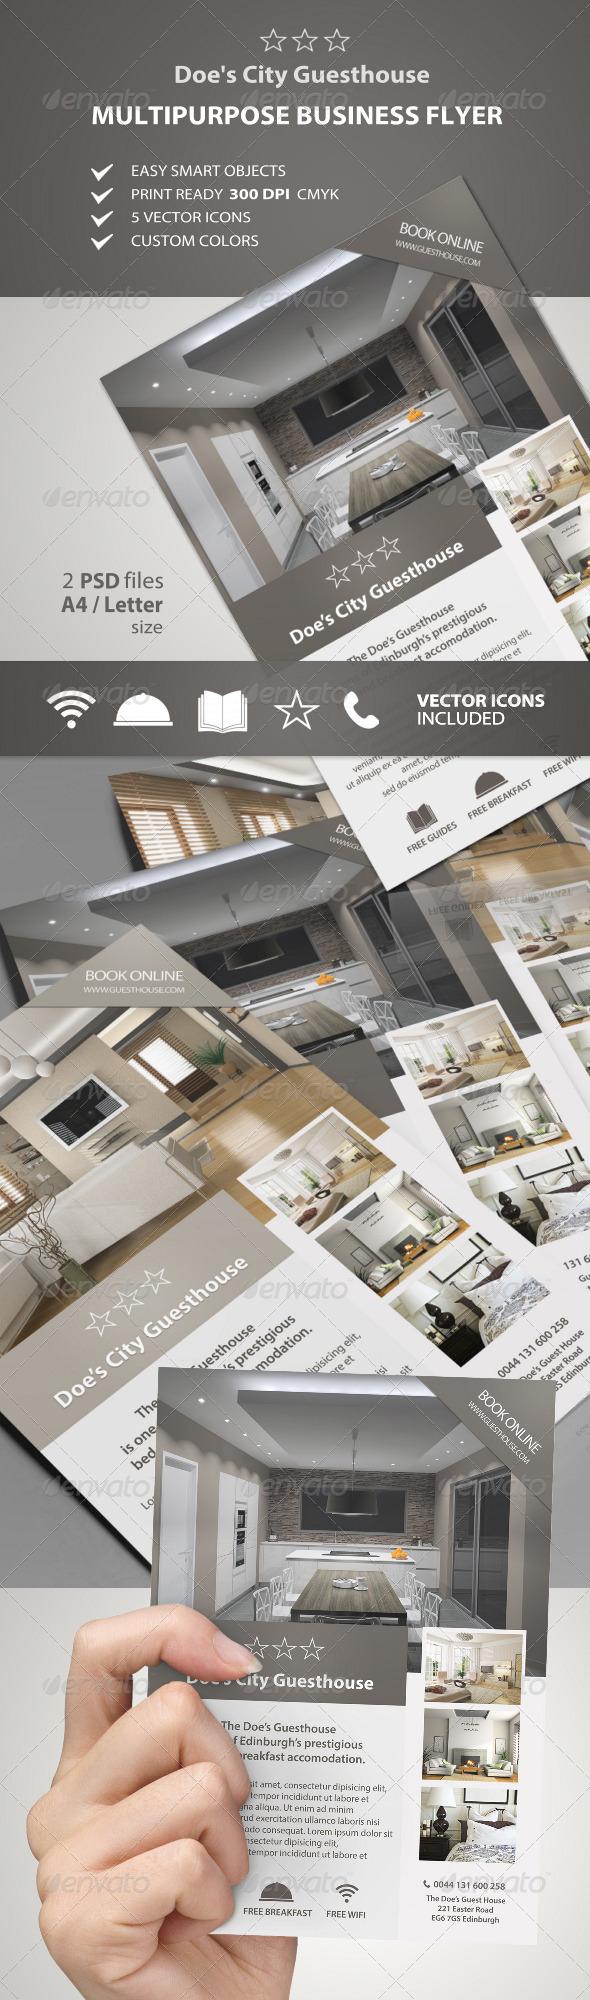 GraphicRiver Multipurpose Business Flyer vol.1 7413426